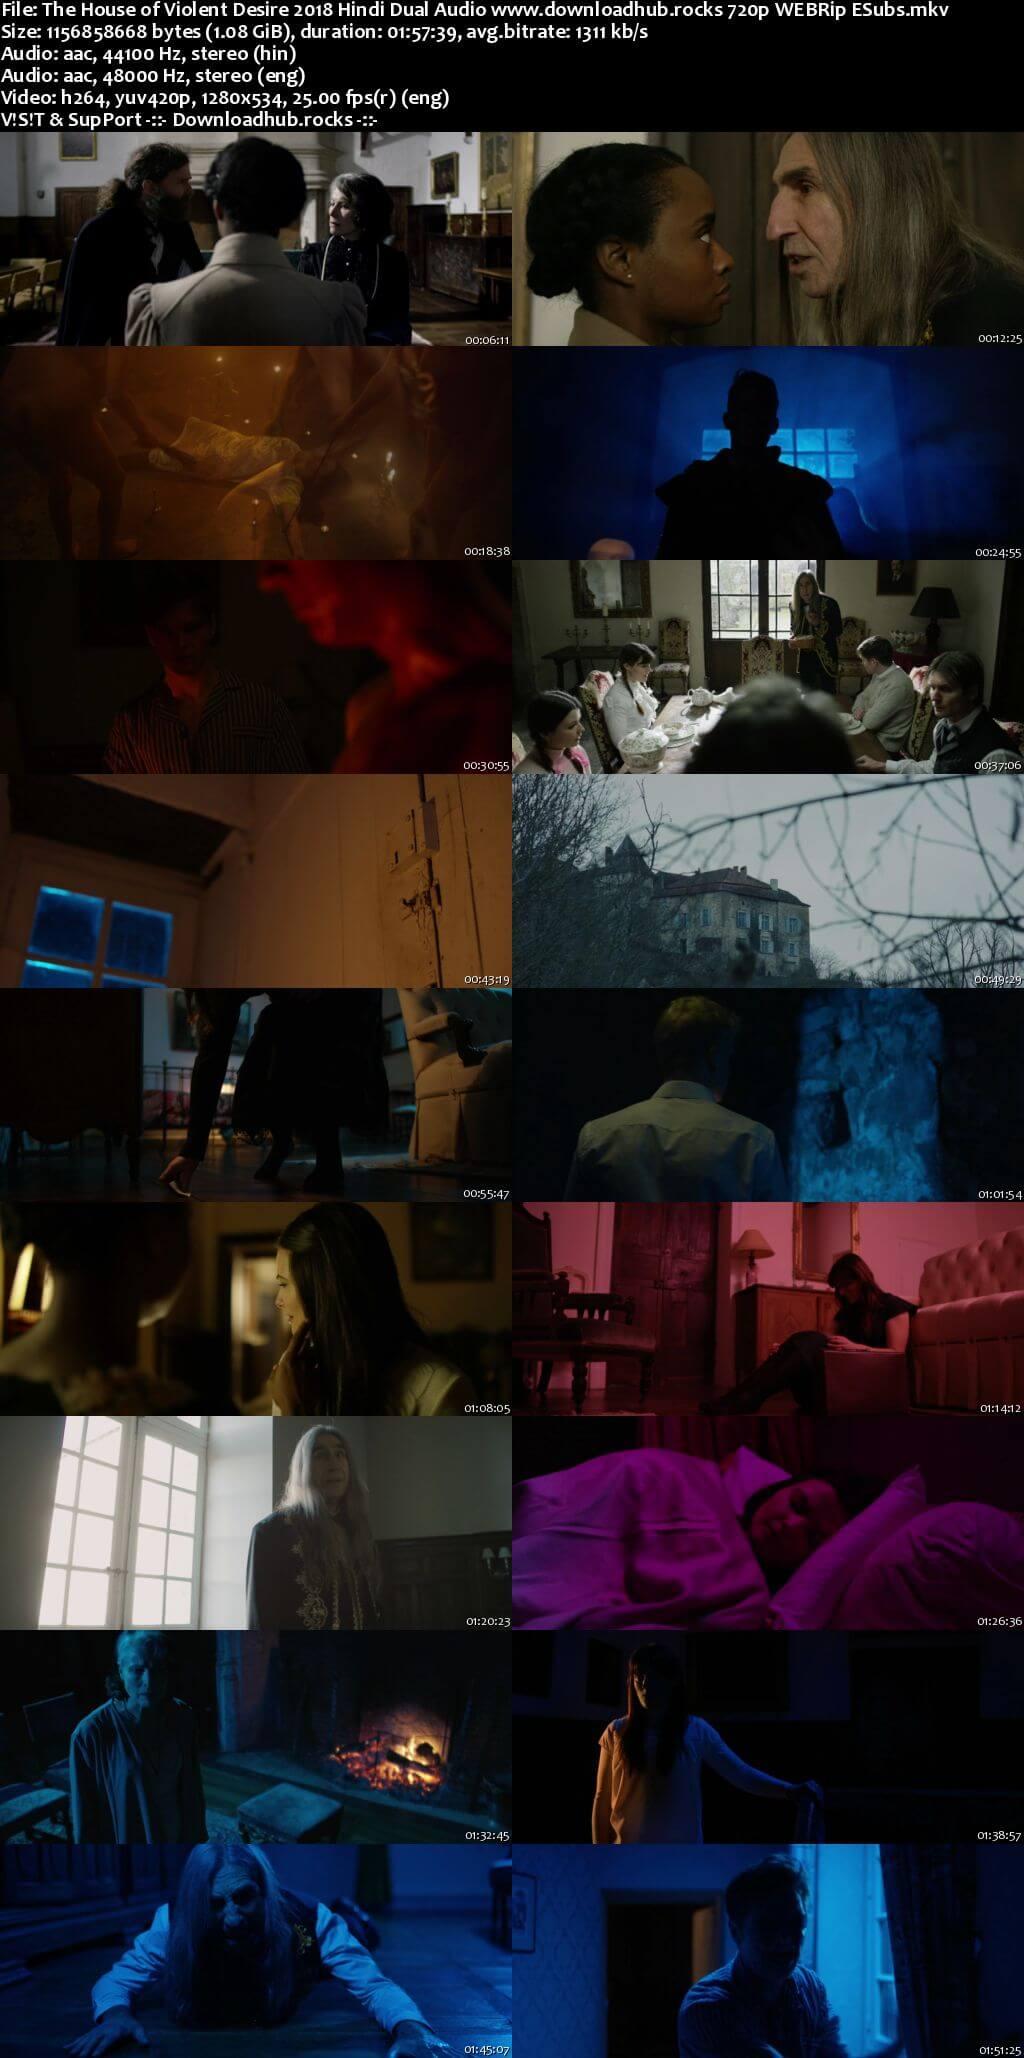 The House of Violent Desire 2018 Hindi Dual Audio 720p WEBRip ESubs